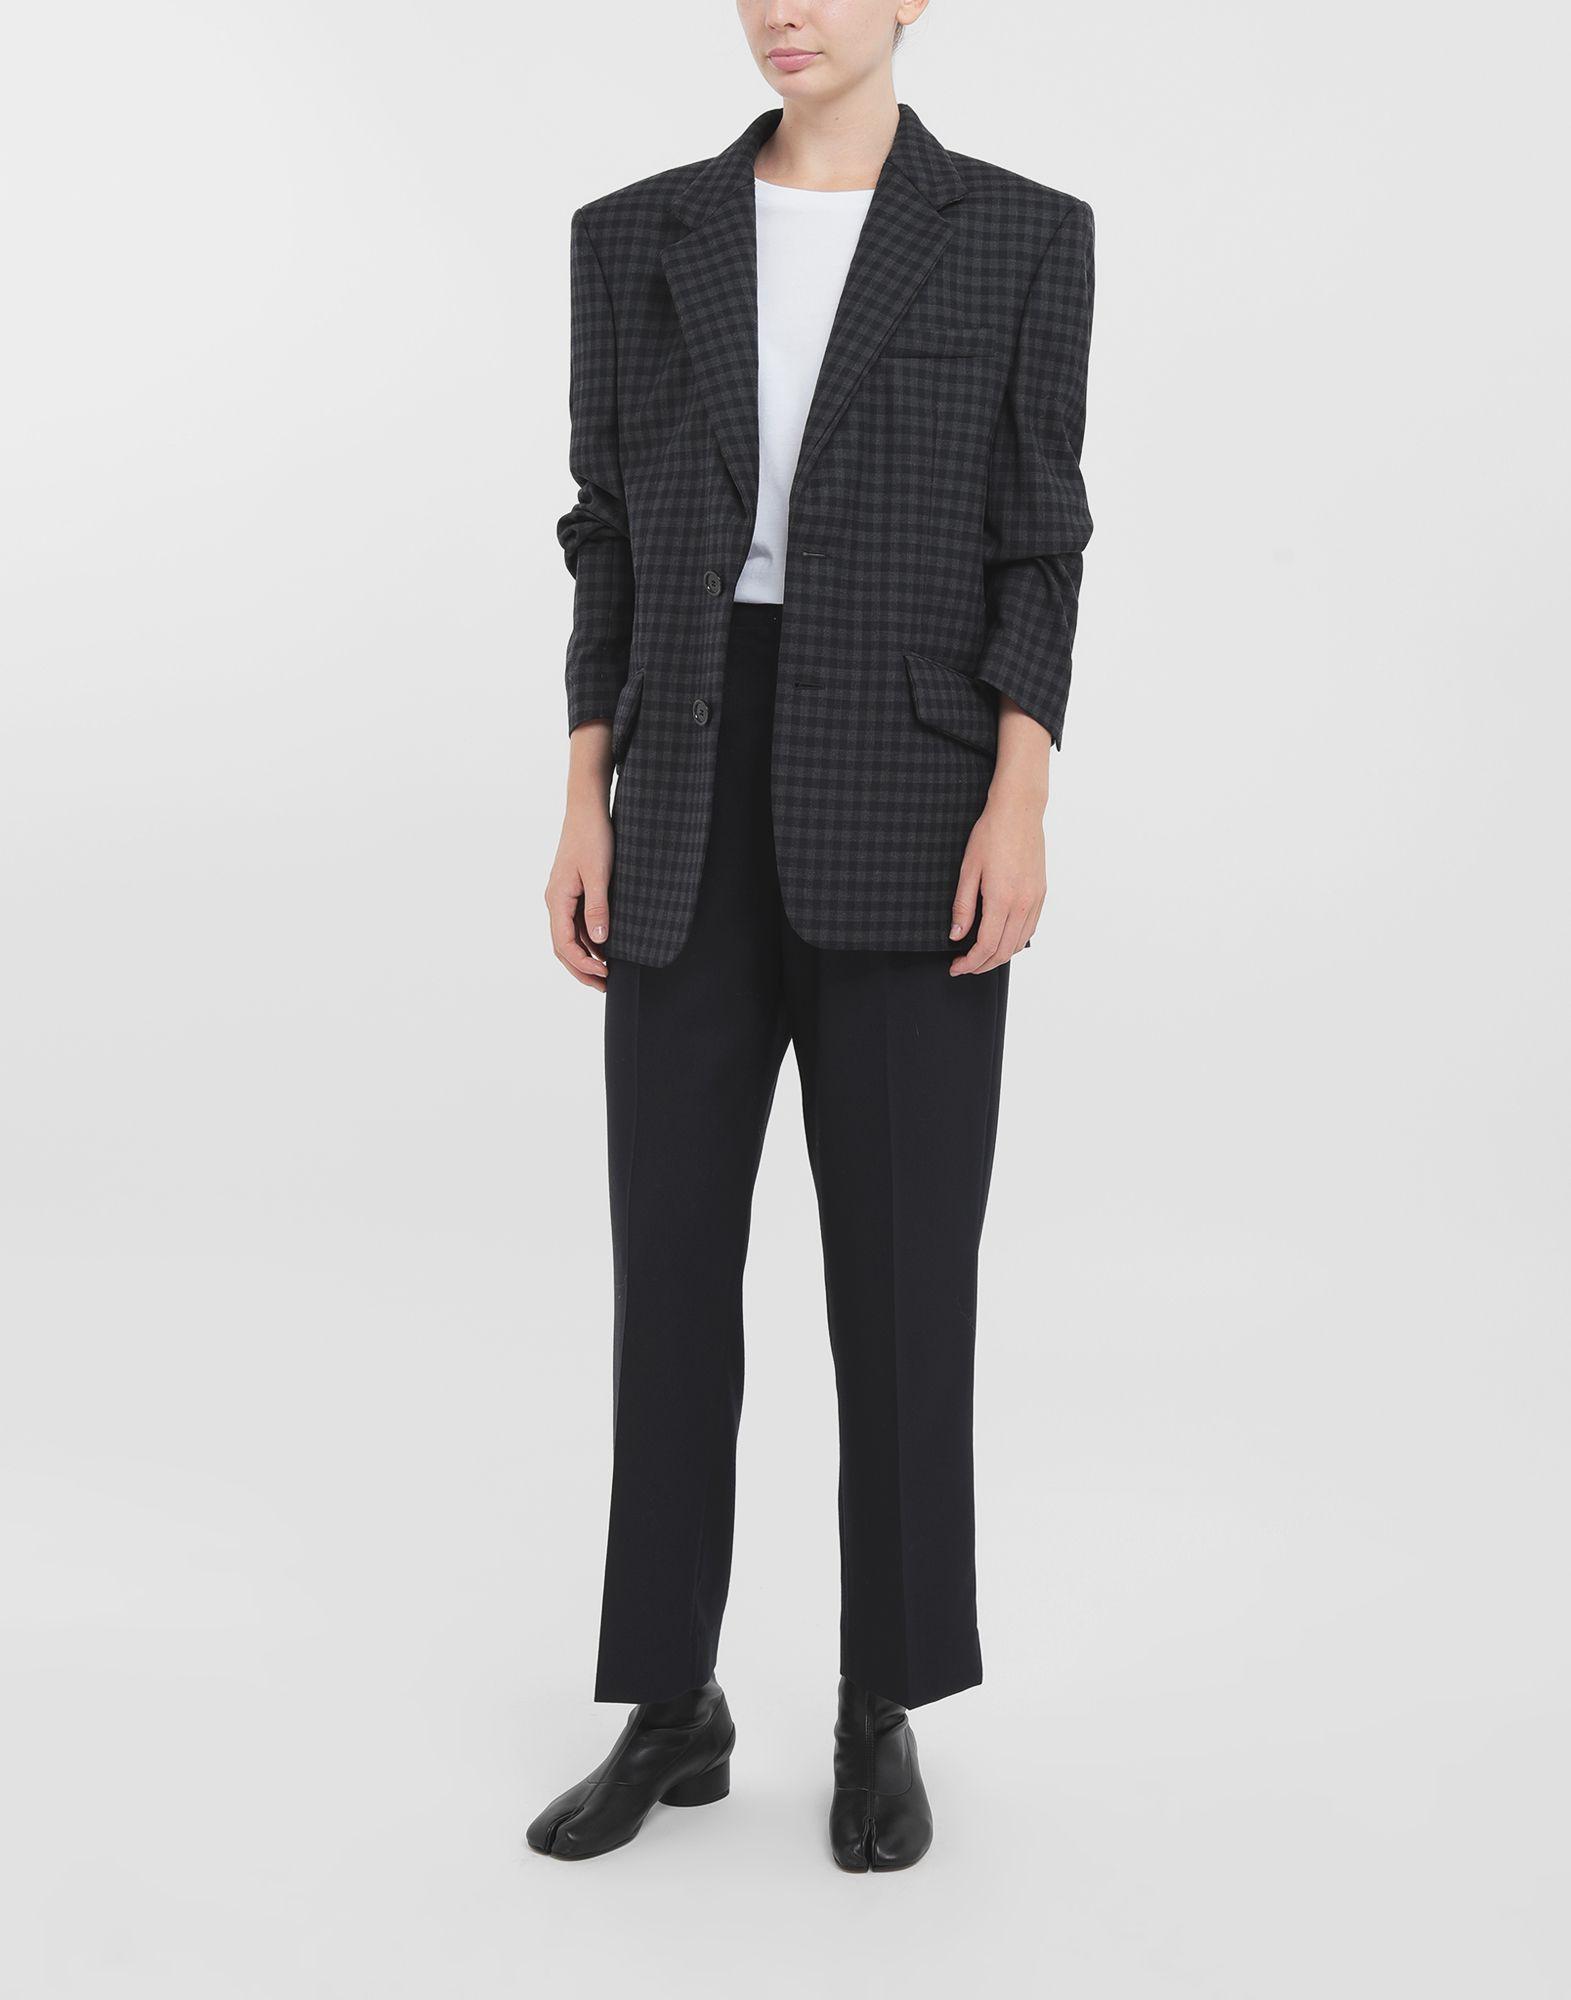 MAISON MARGIELA Tailored pants Casual pants Woman b